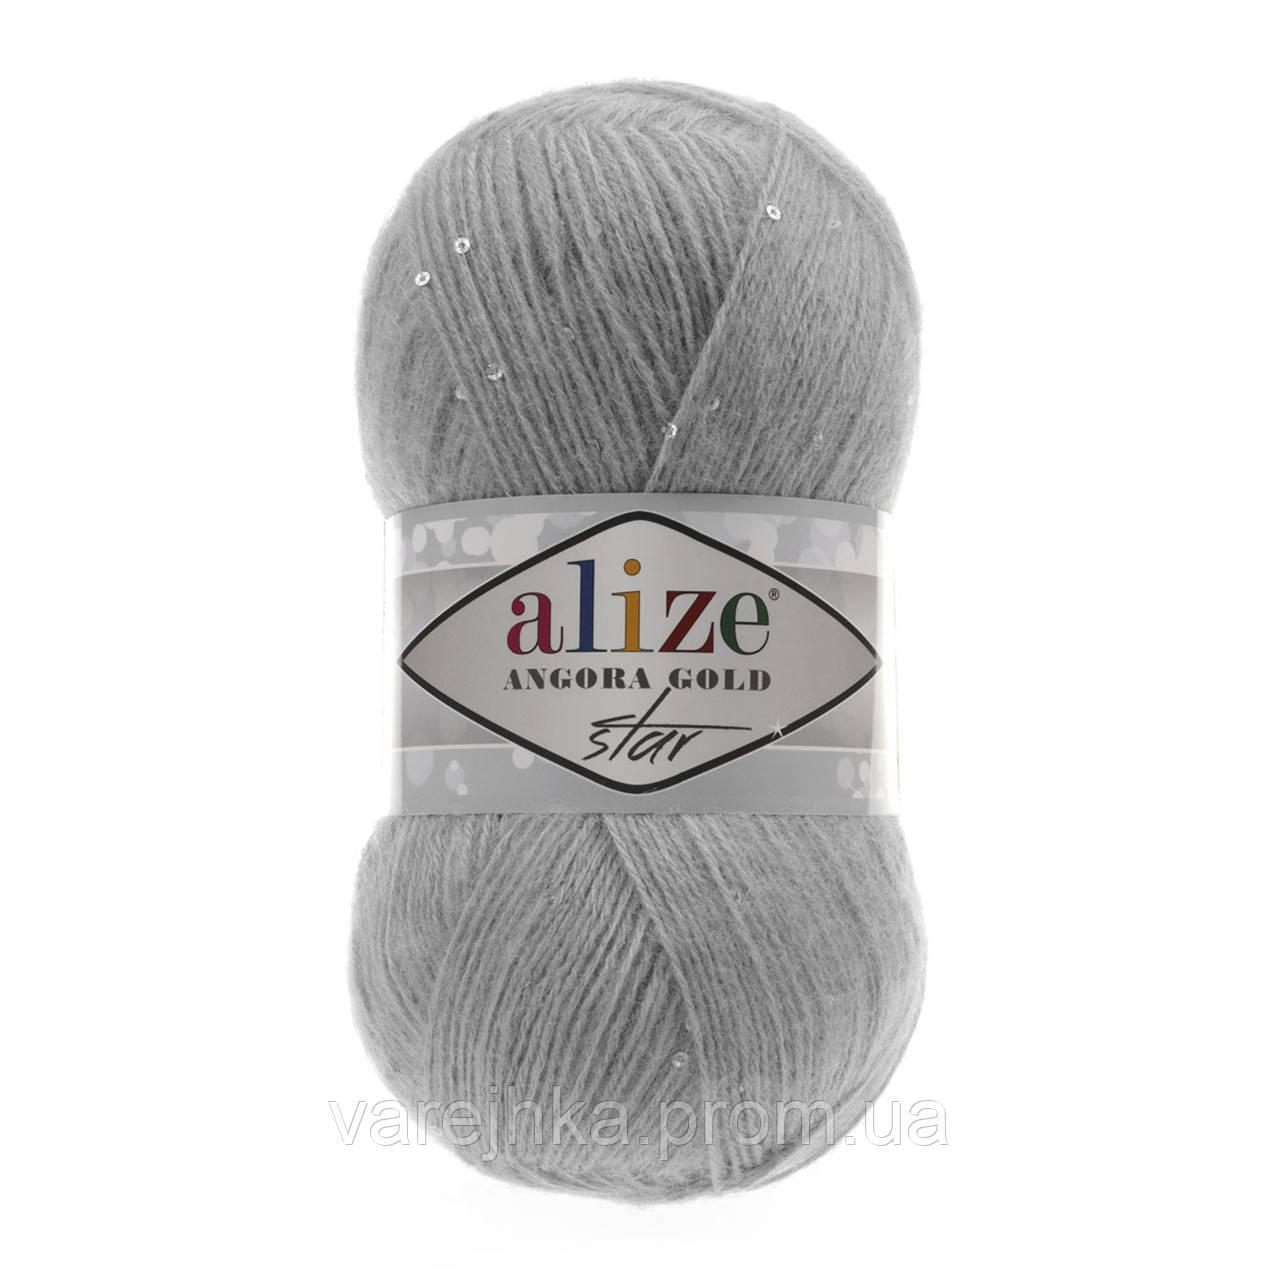 пряжа с паетками Alize Angora Gold Star 21 серый ангора голд стар